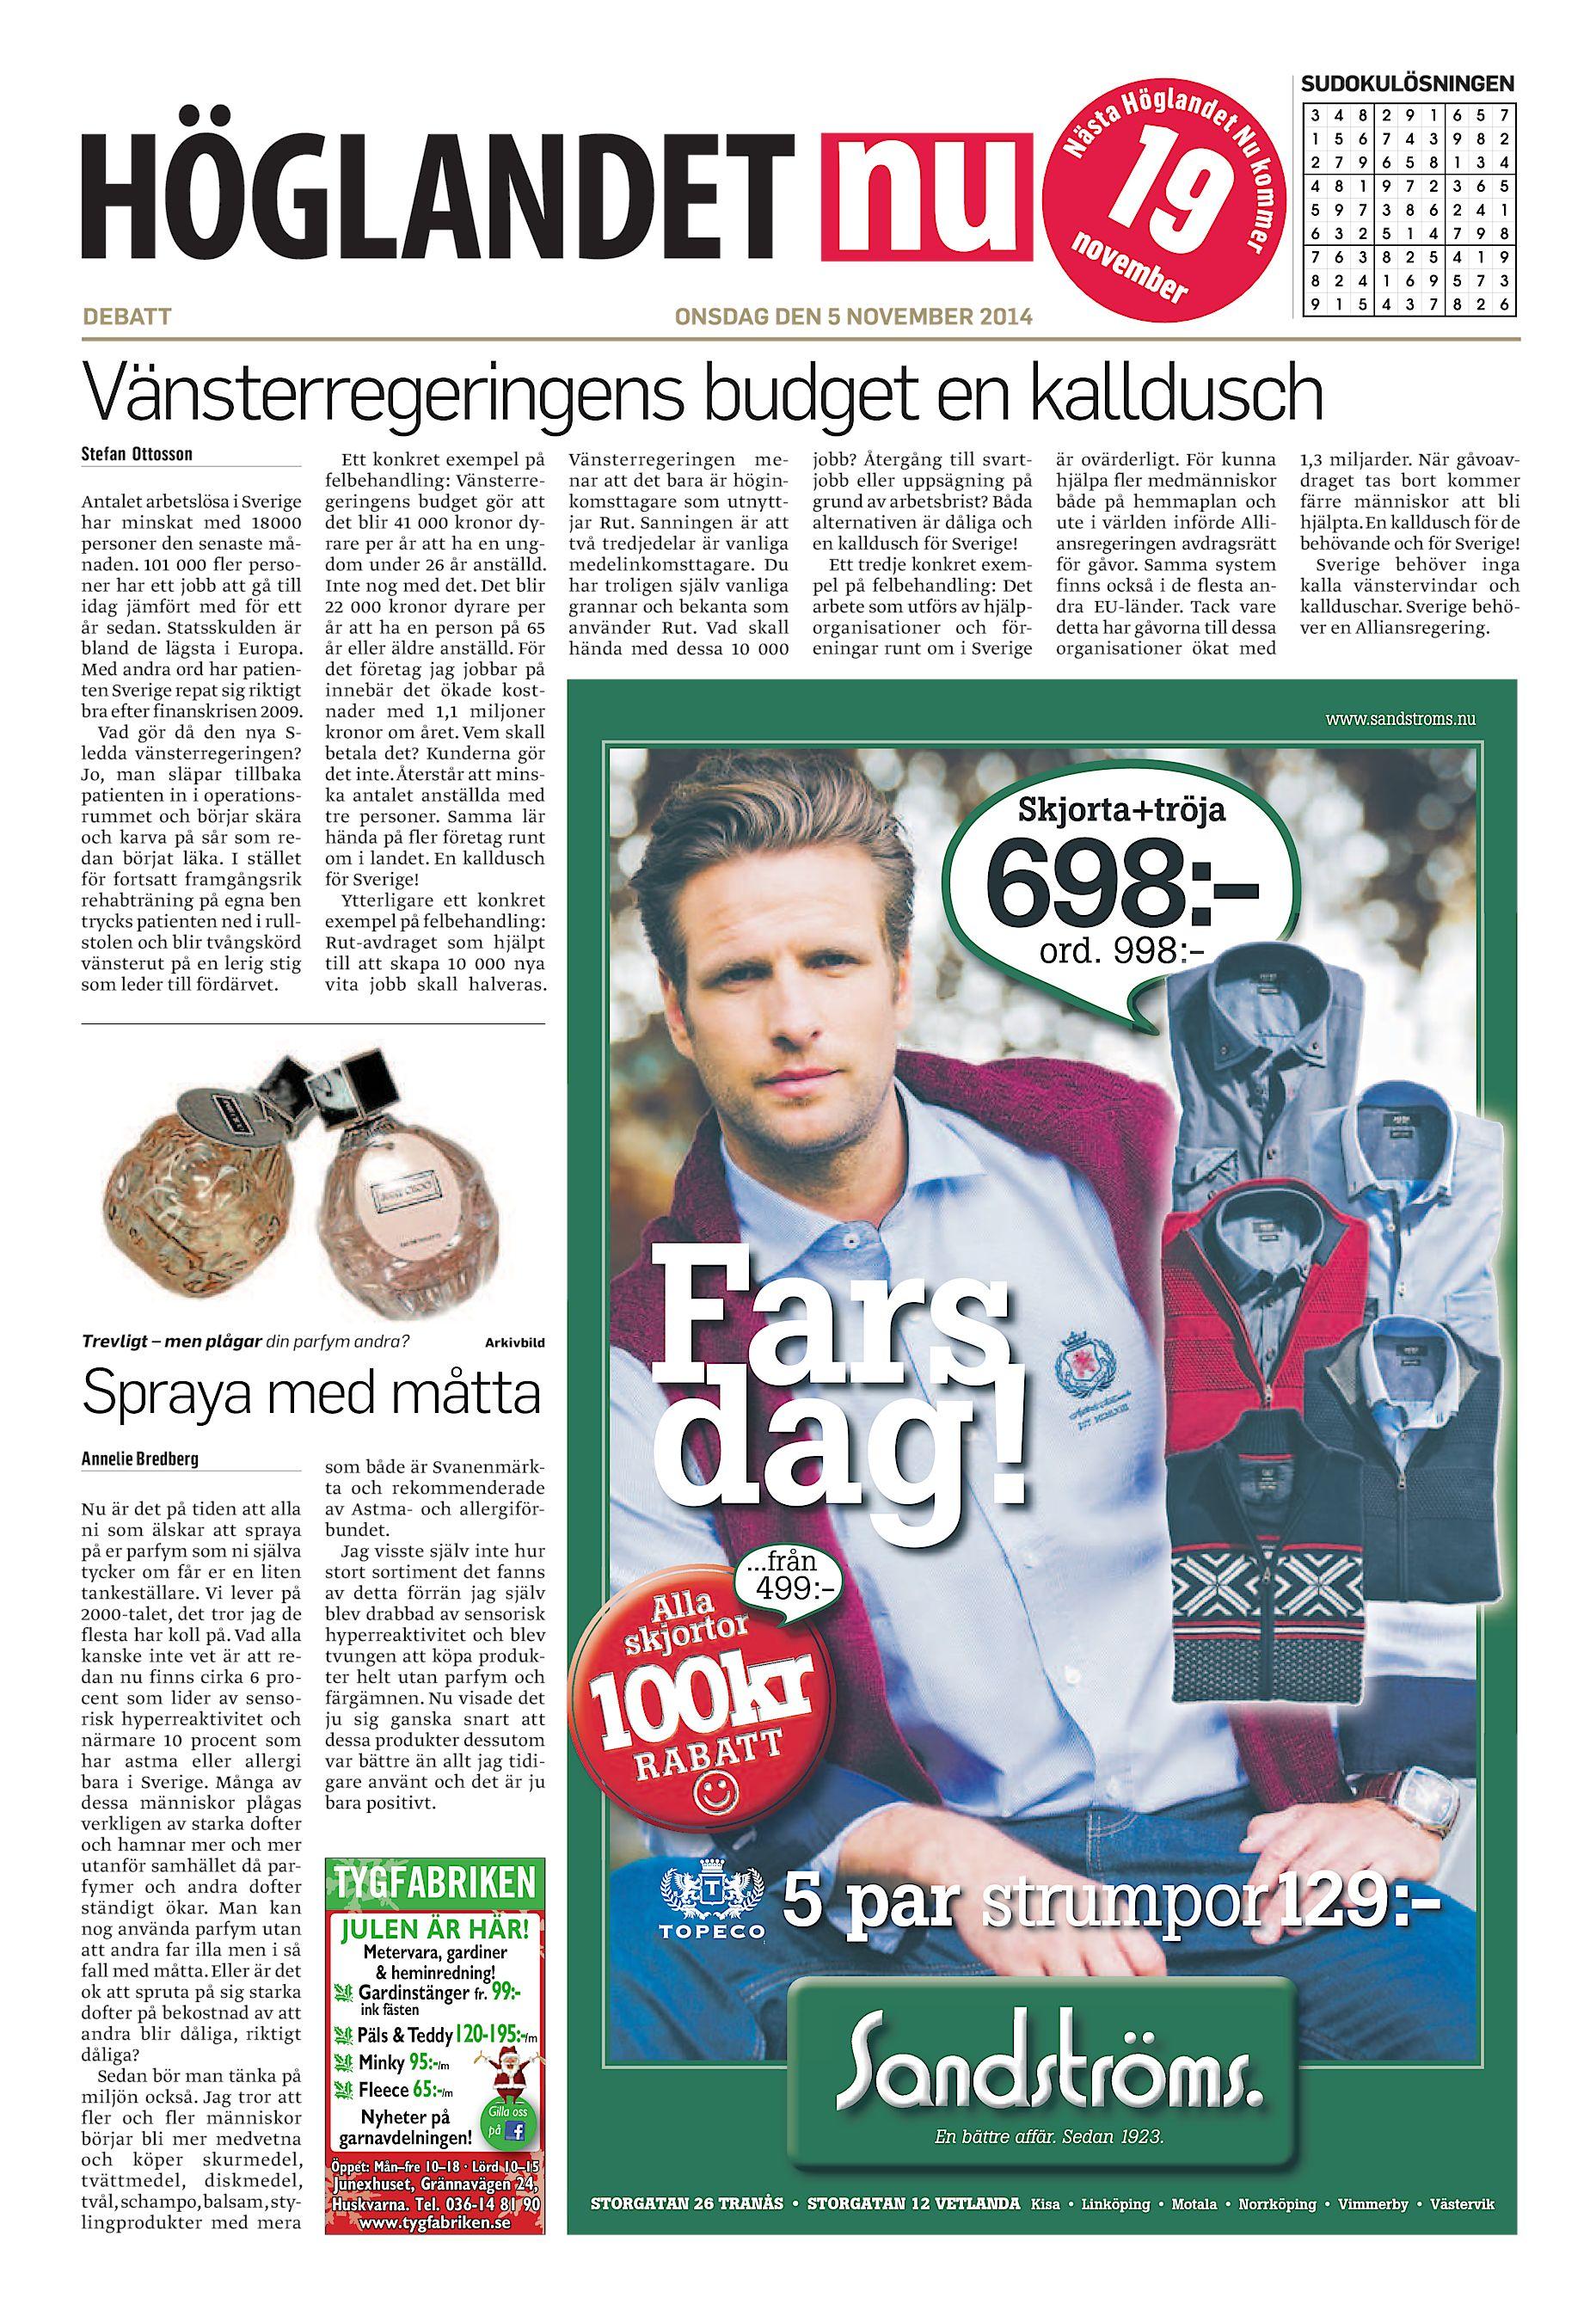 Visa inlgg - ulla_svensson | Anbytarforum